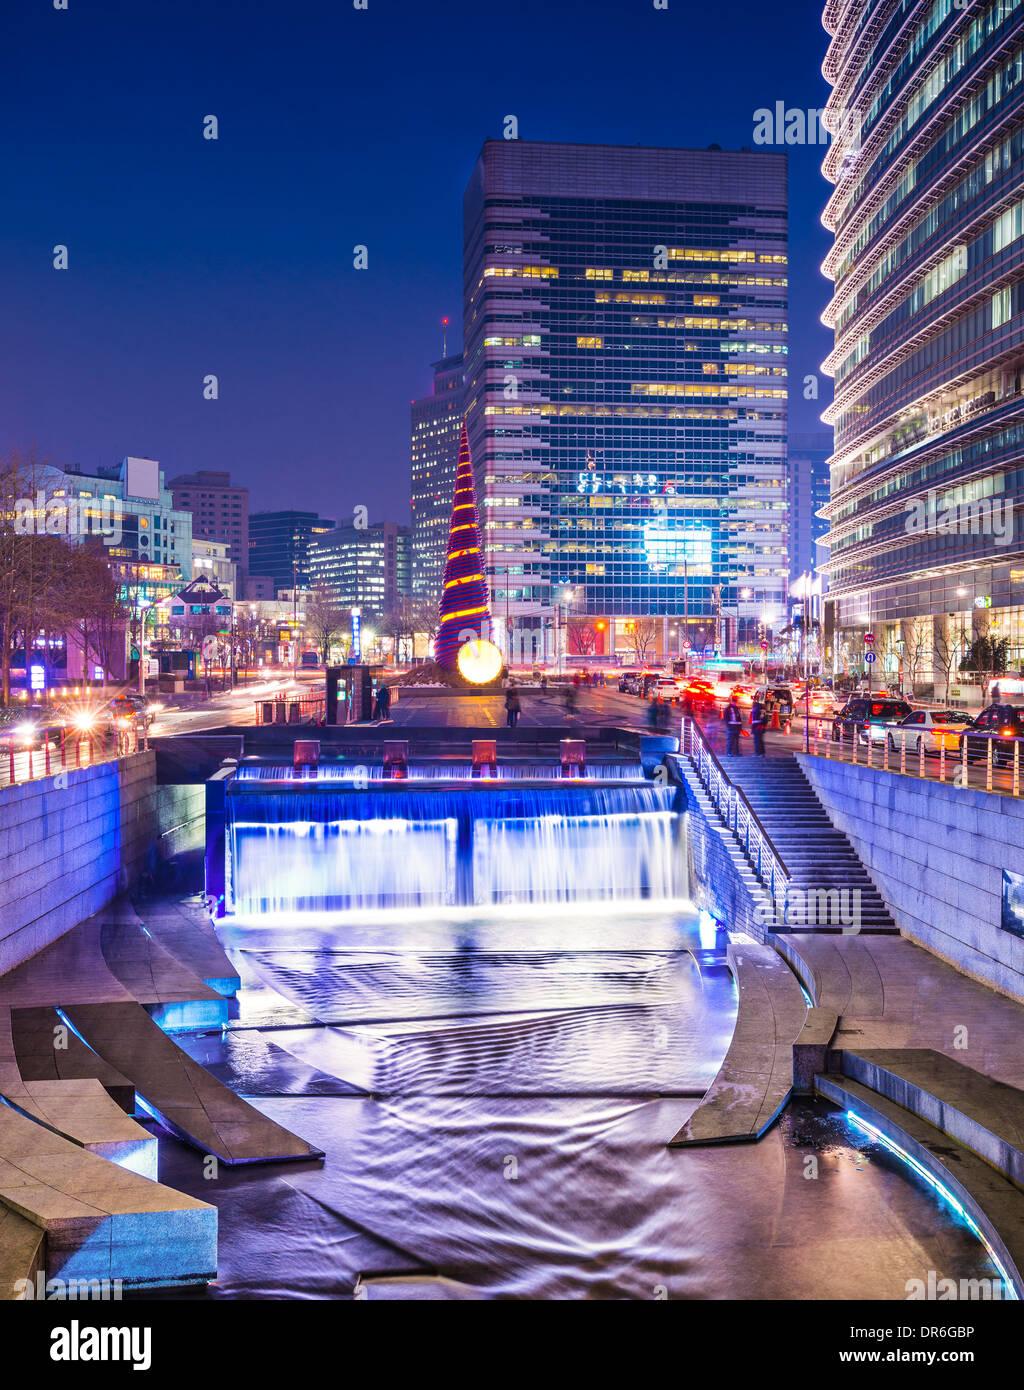 Seoul, South Korea at Cheonggye Stream. - Stock Image